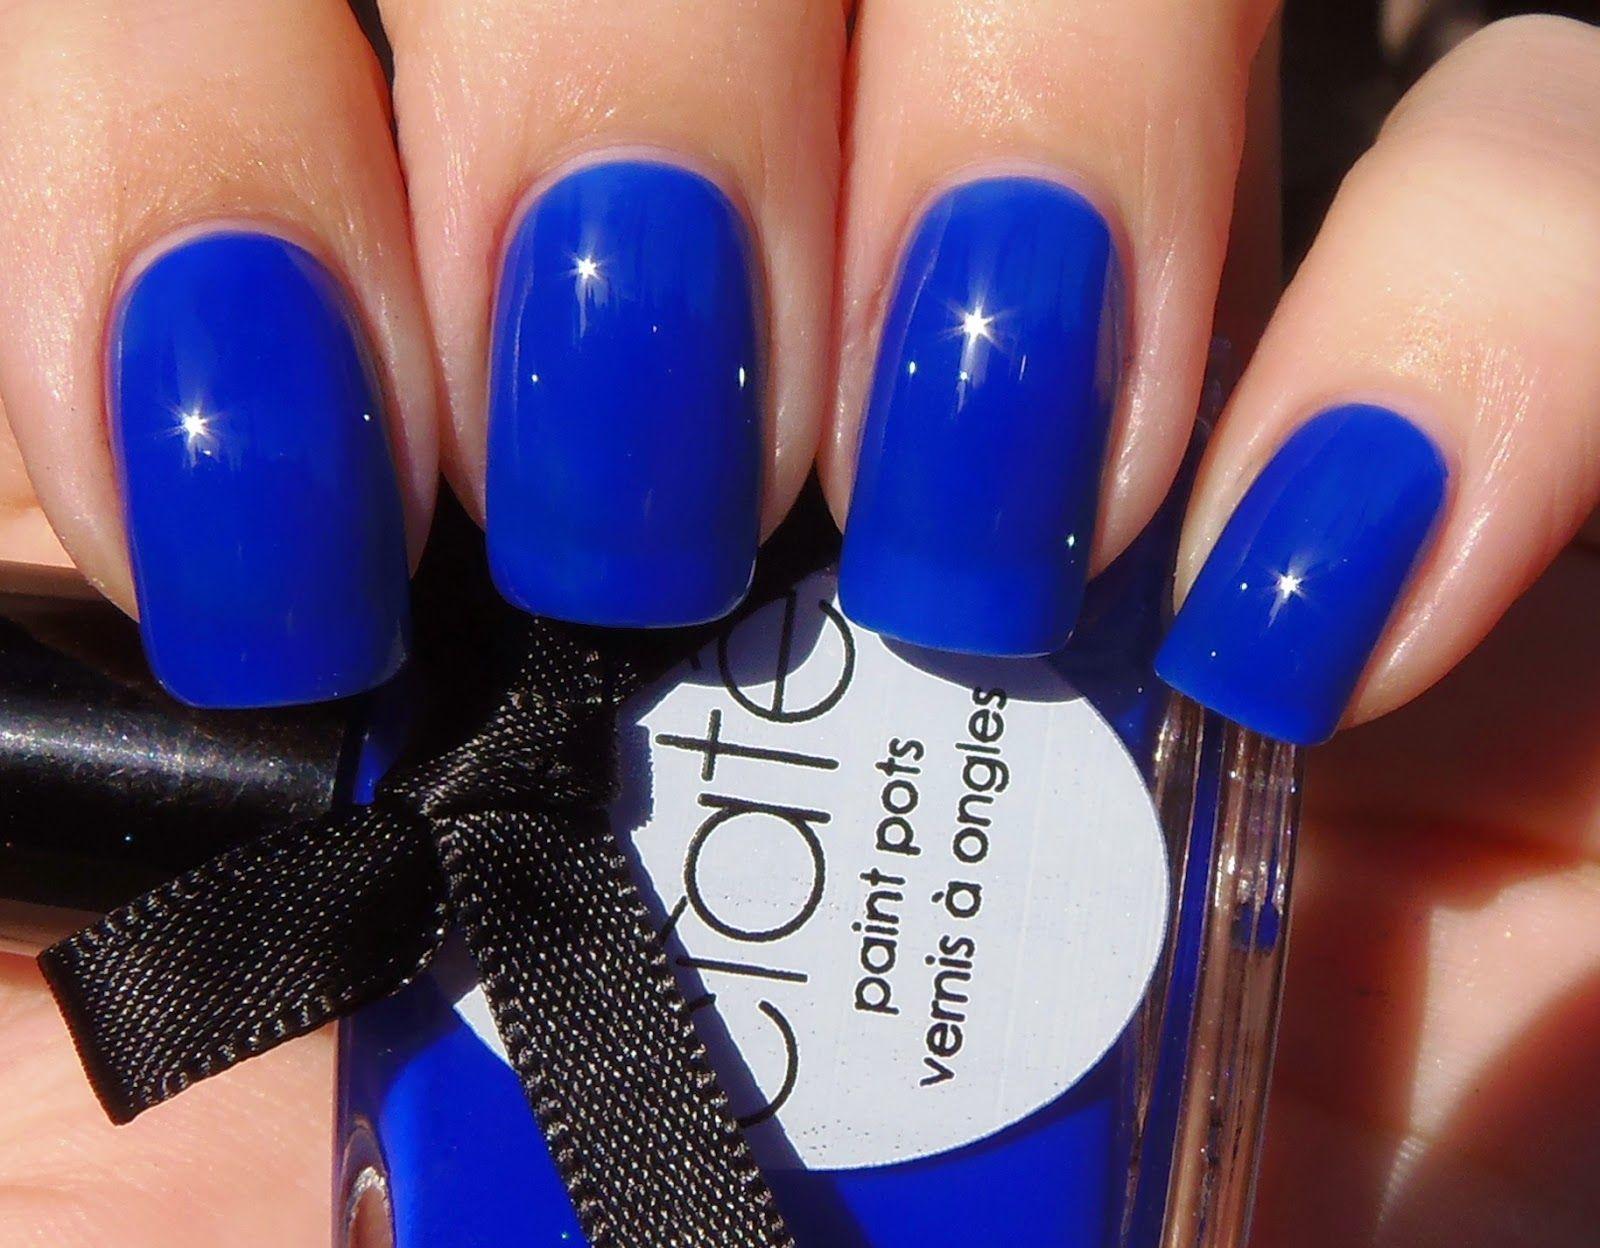 Mani blue teen